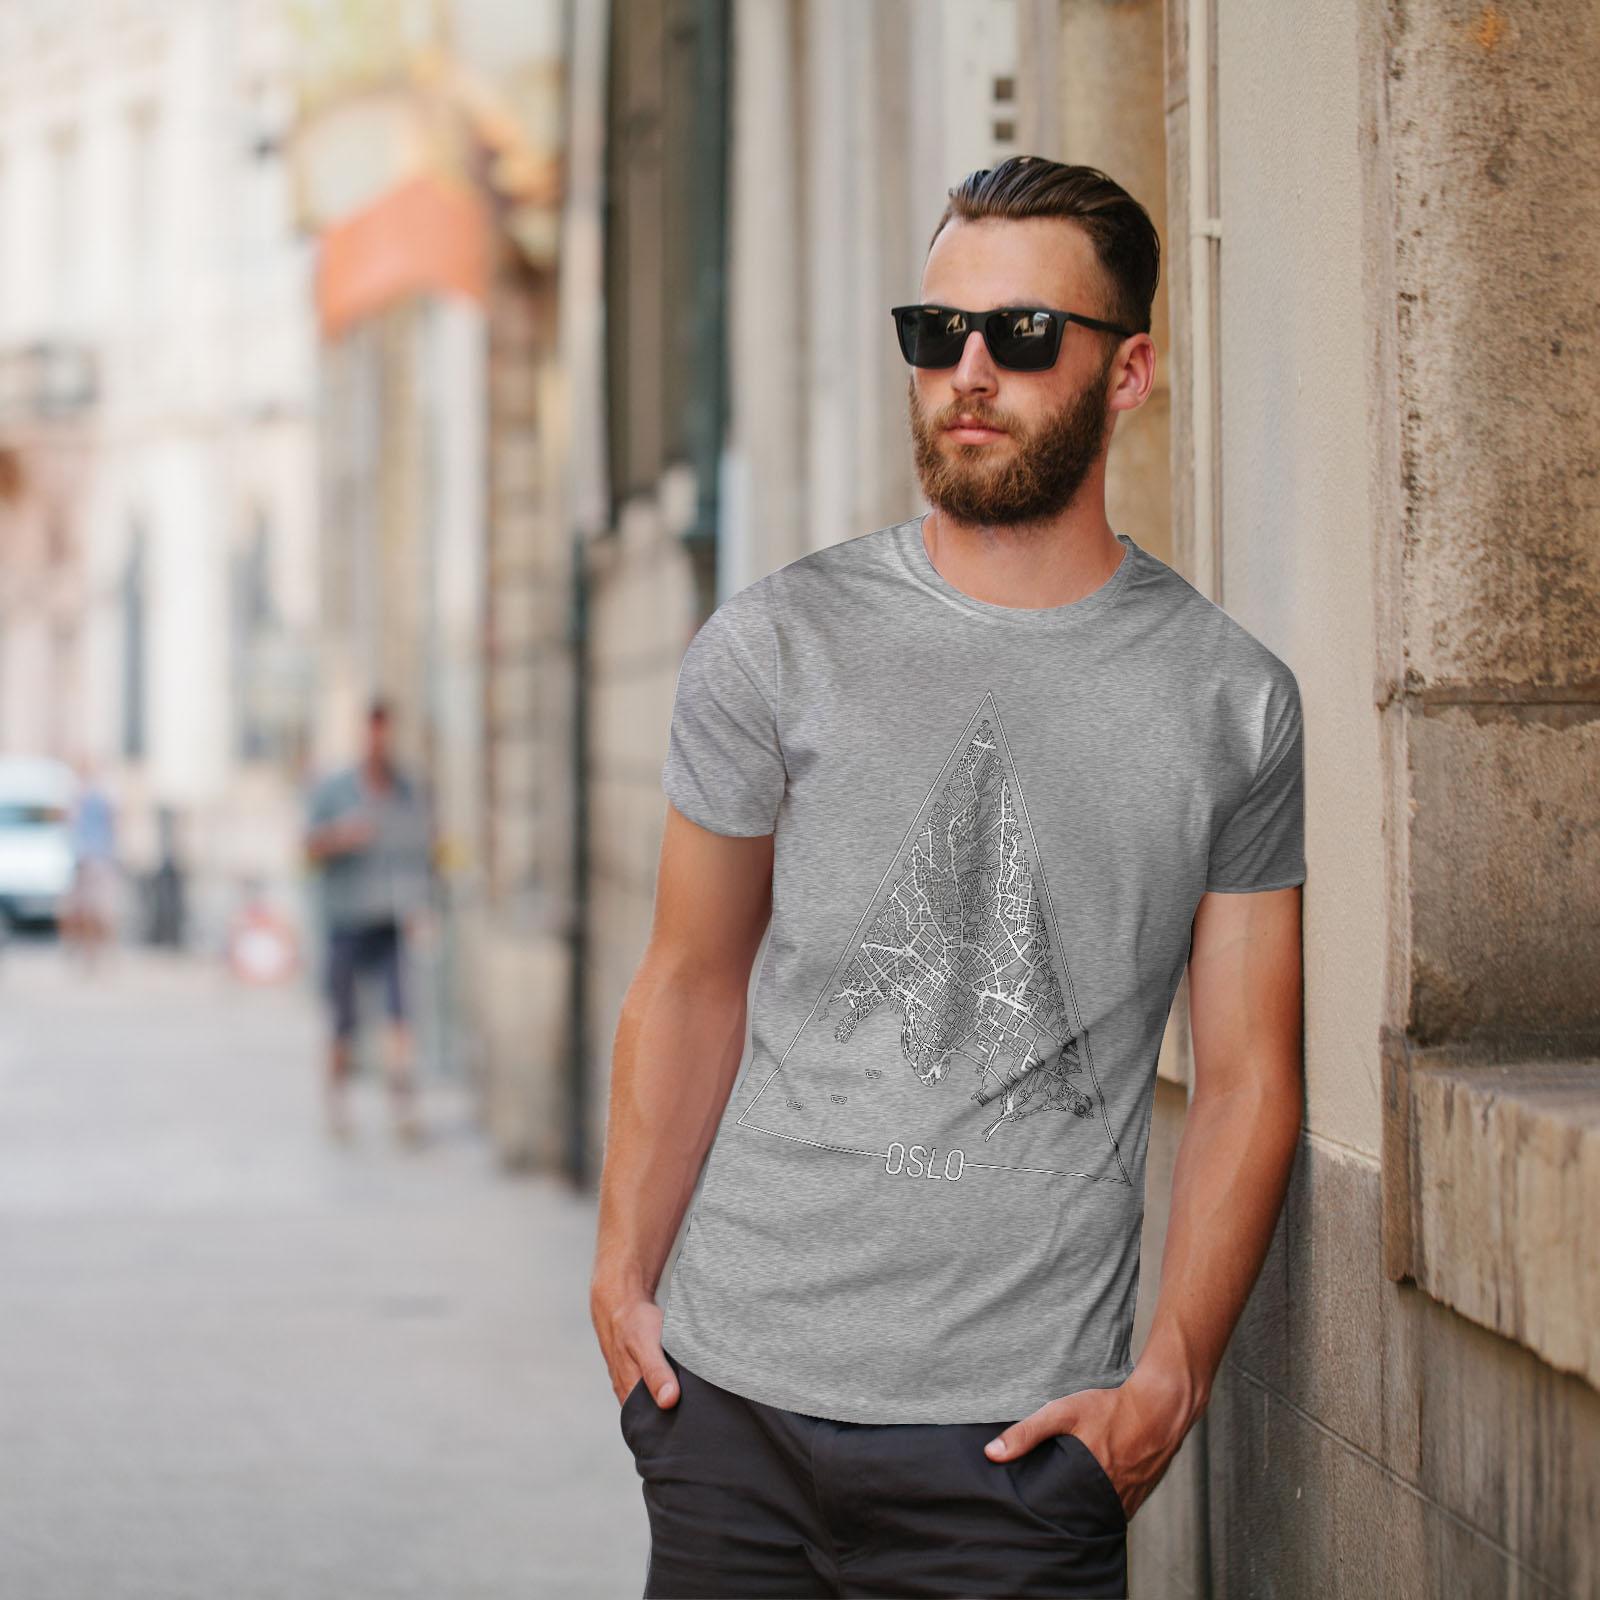 Wellcoda-Norvegia-Big-City-Oslo-da-uomo-T-shirt-Citta-design-grafico-stampato-T-shirt miniatura 17